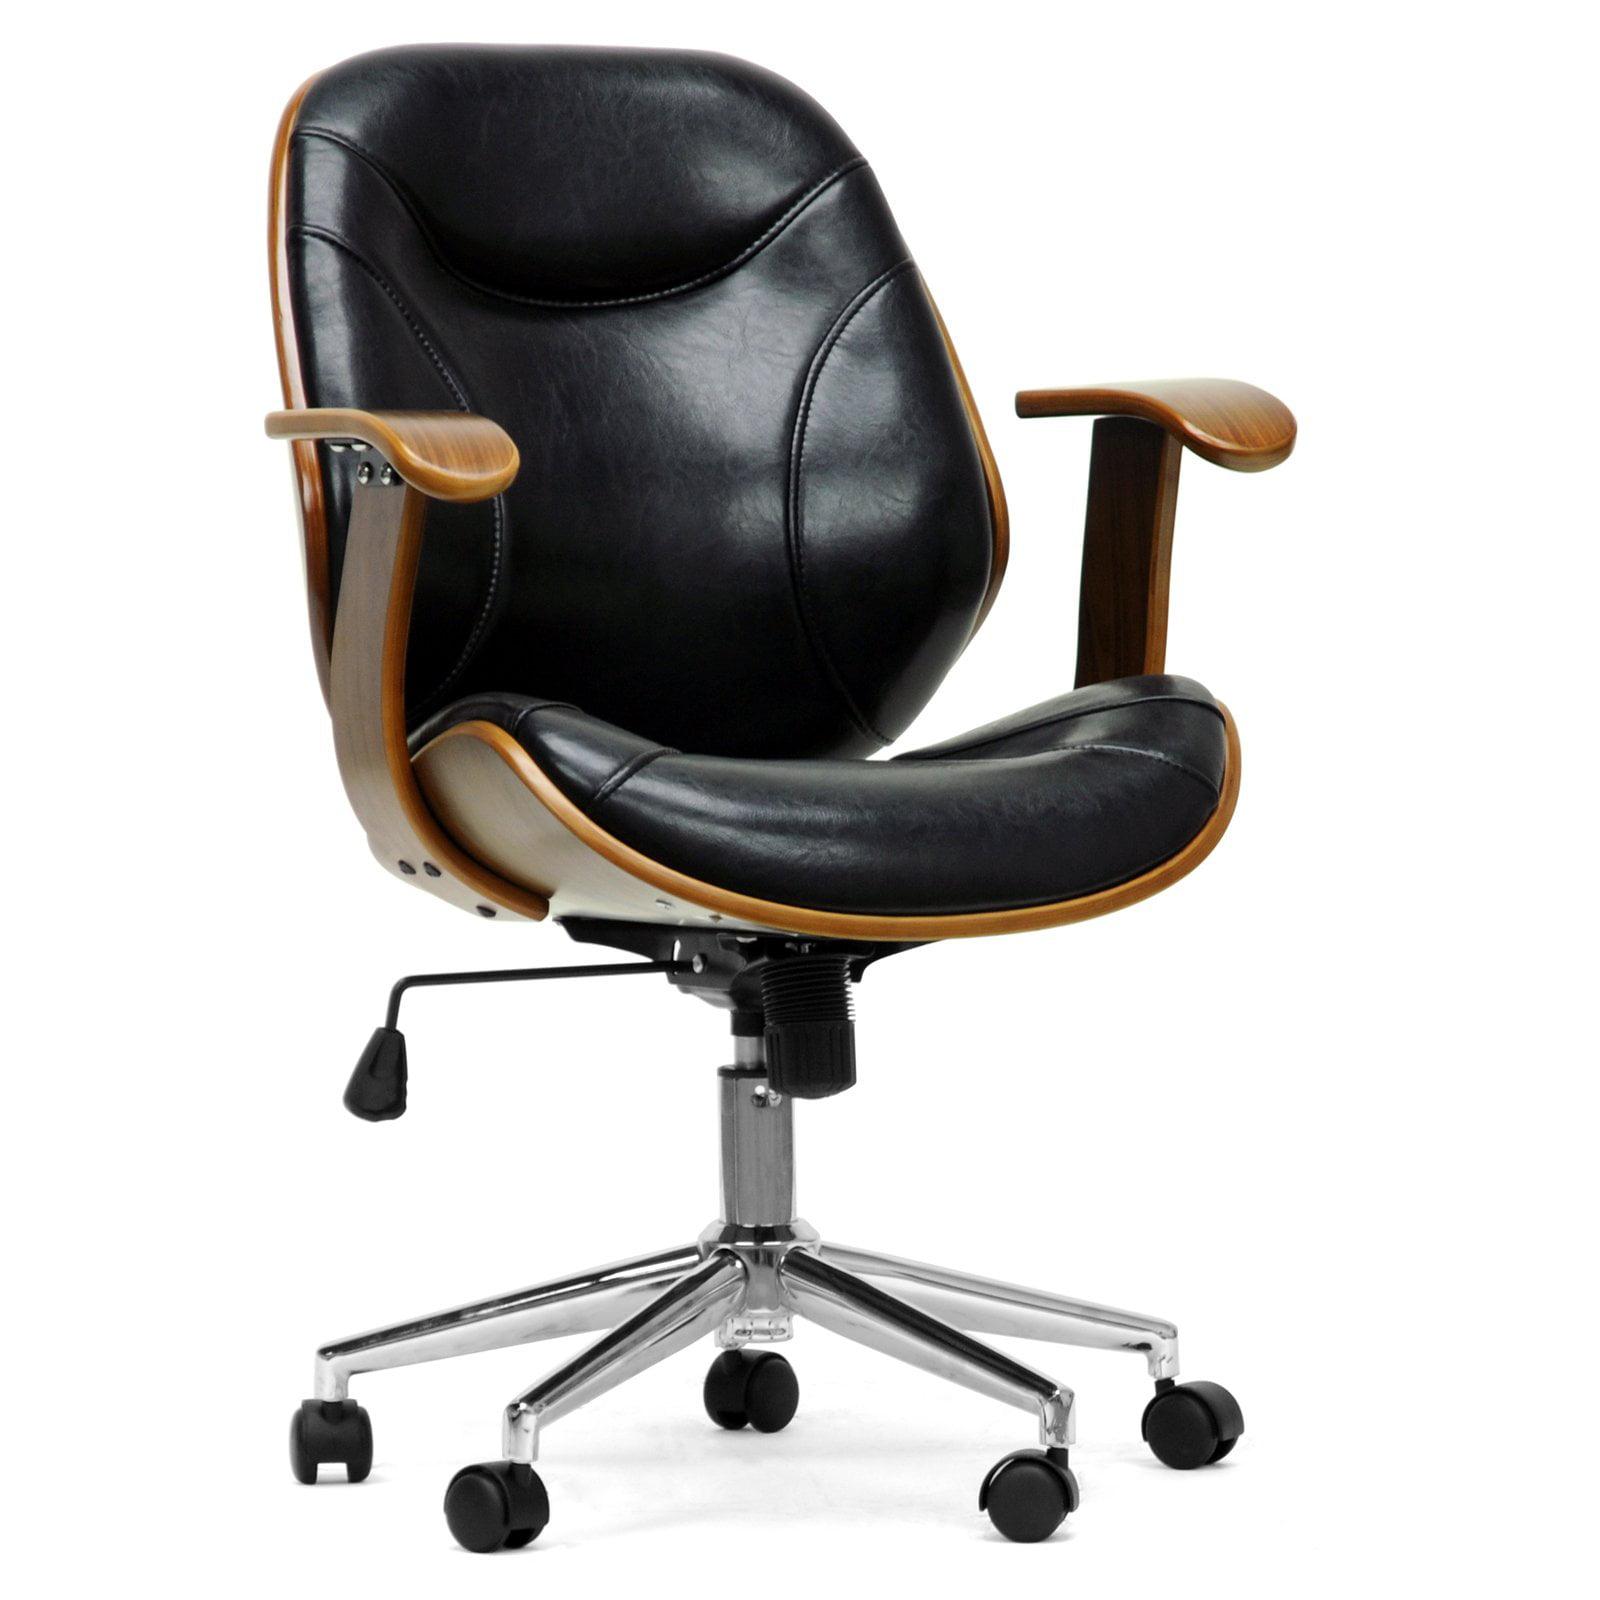 Miraculous Baxton Studio Rathburn Modern Office Chair Walnut Black Interior Design Ideas Gentotryabchikinfo